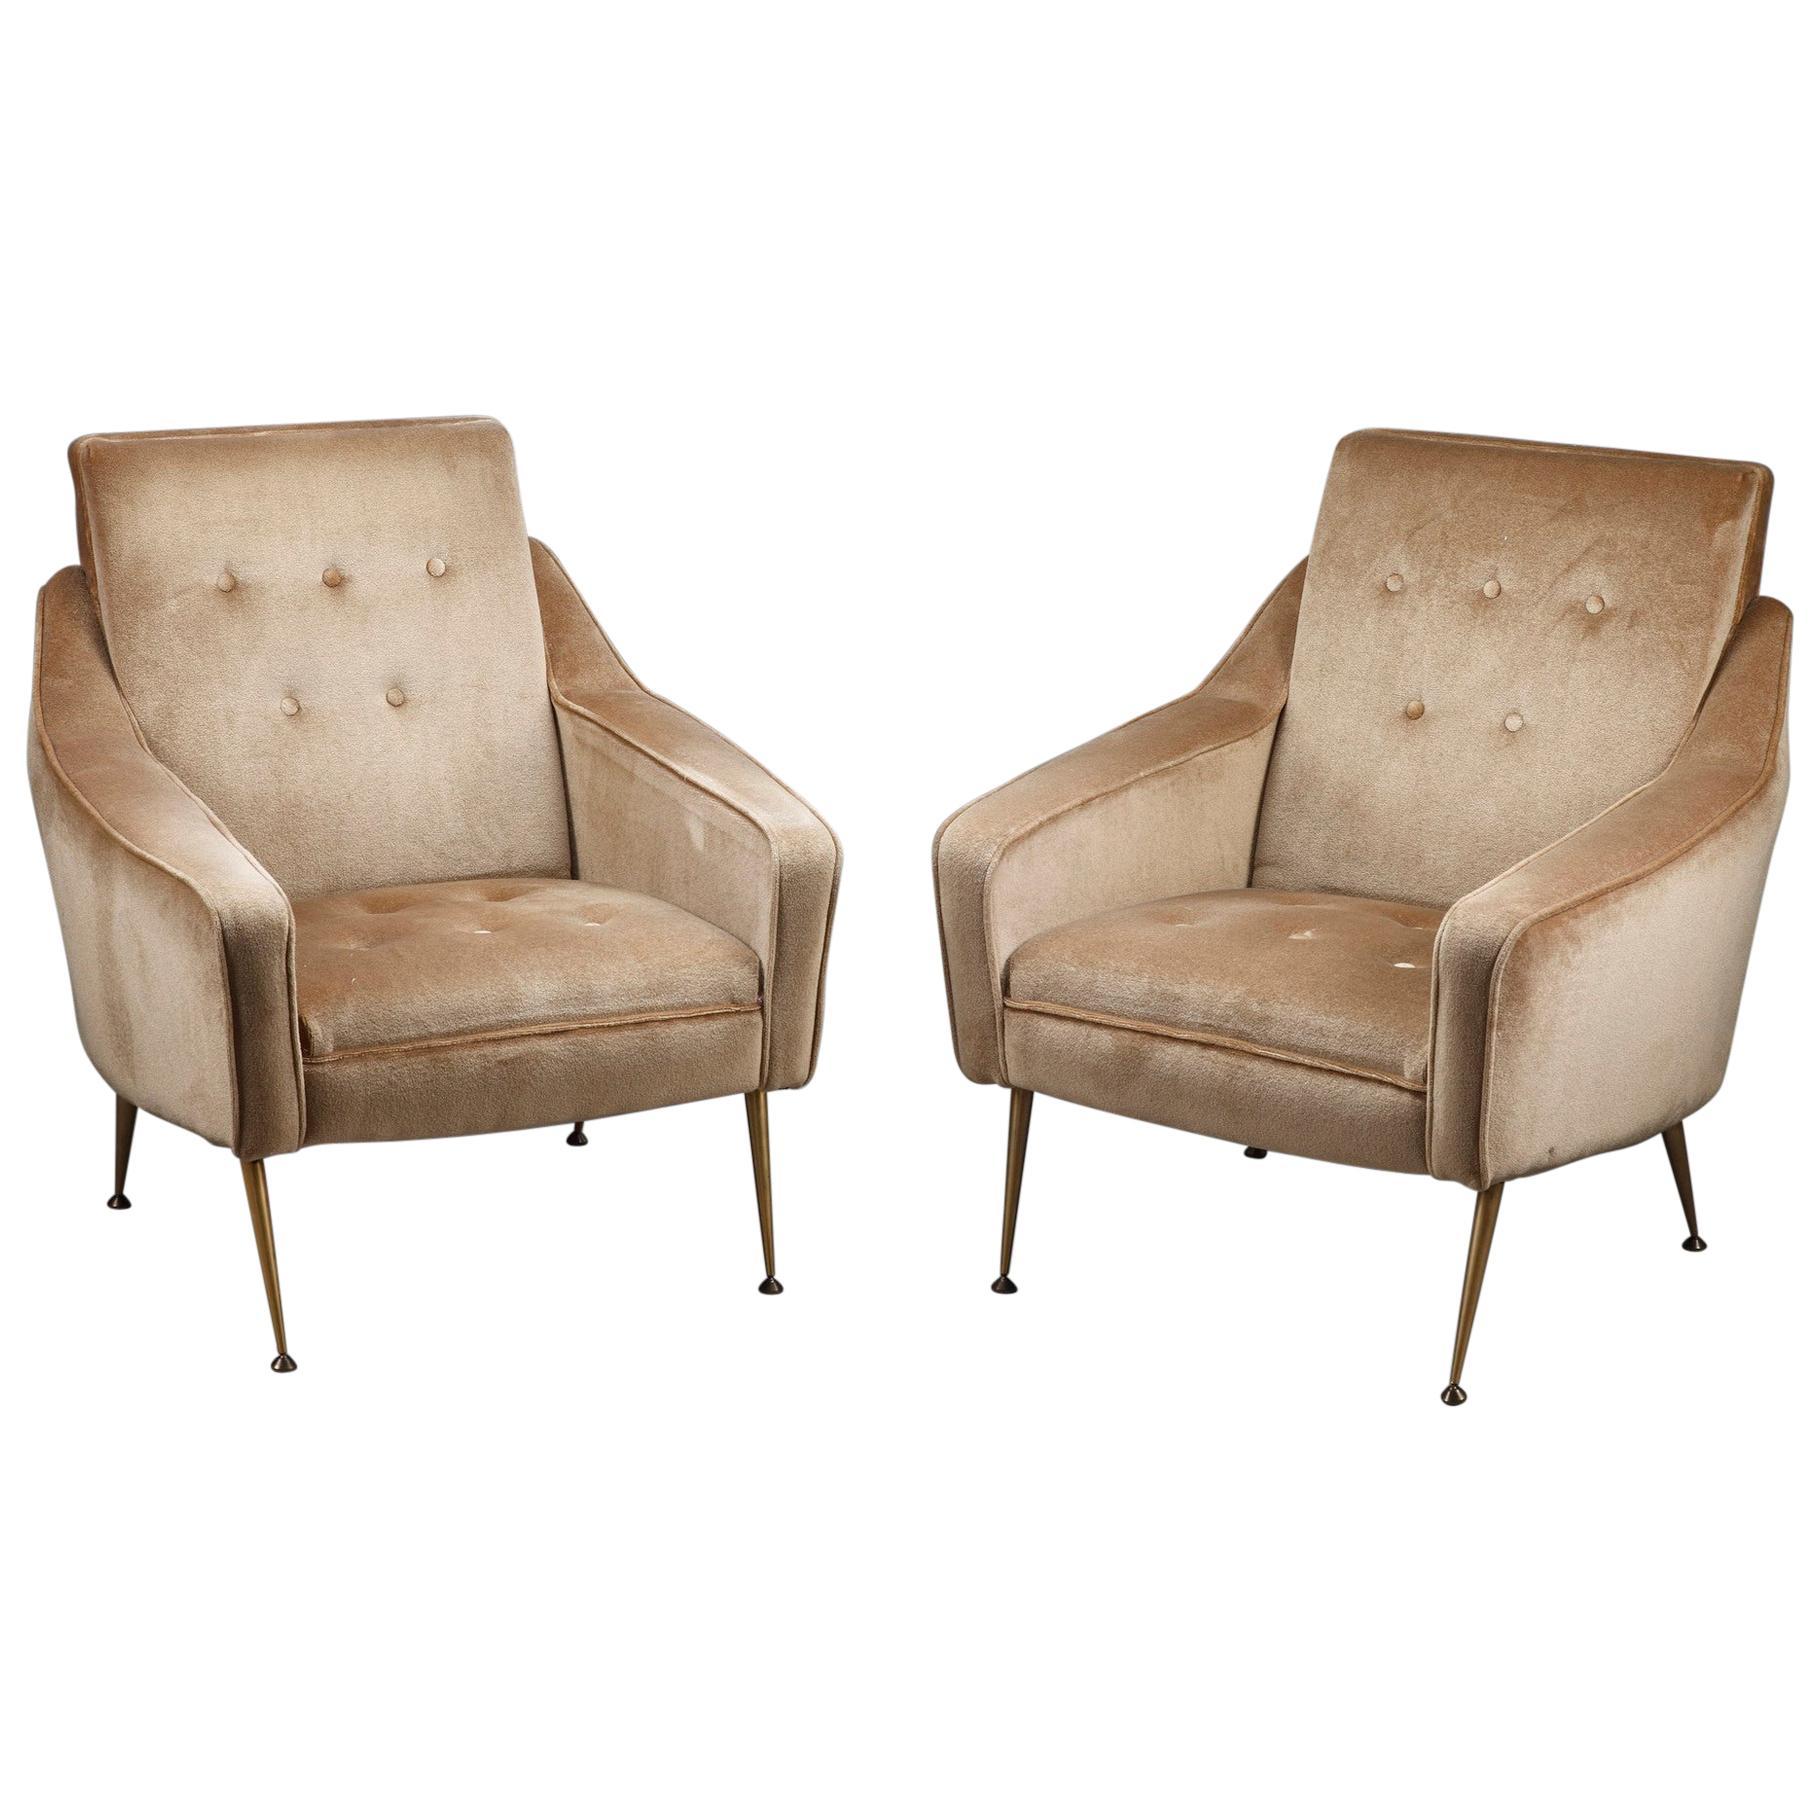 Pair of Velvet Bergère Chairs, 1950s